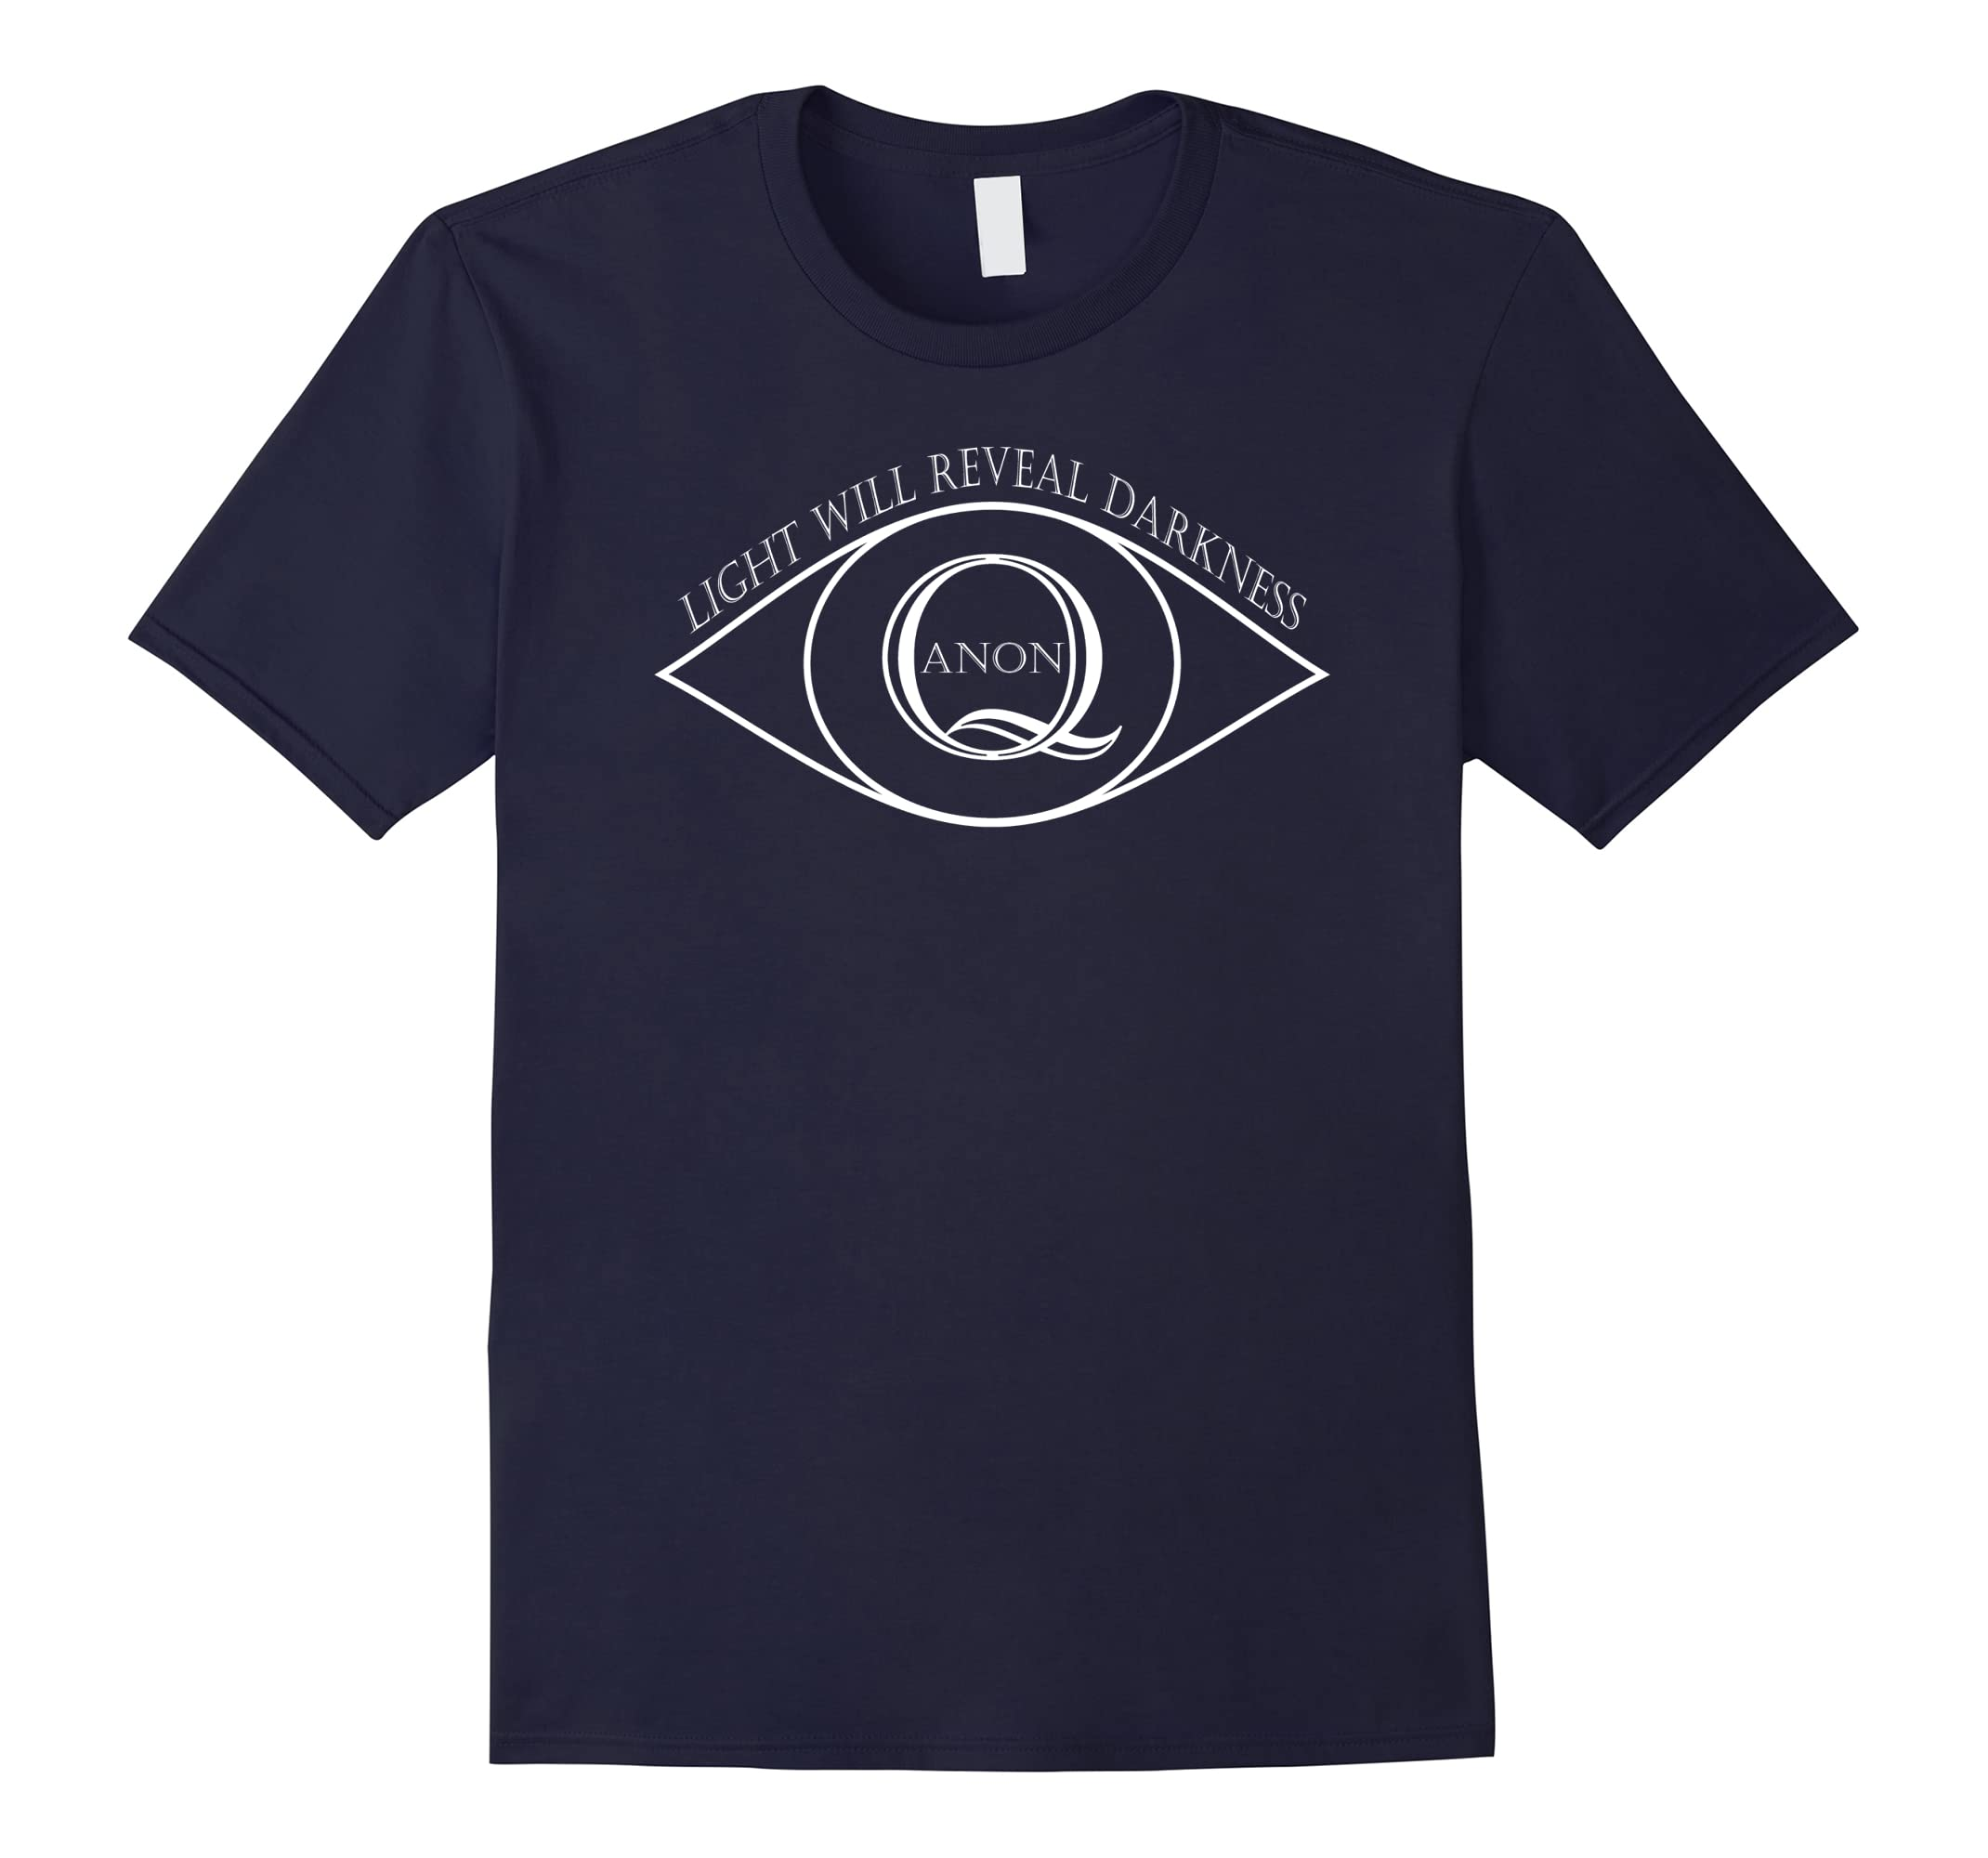 Q Anon Eyeball Light Will Reveal Darkness Patriotic T-shirt-RT